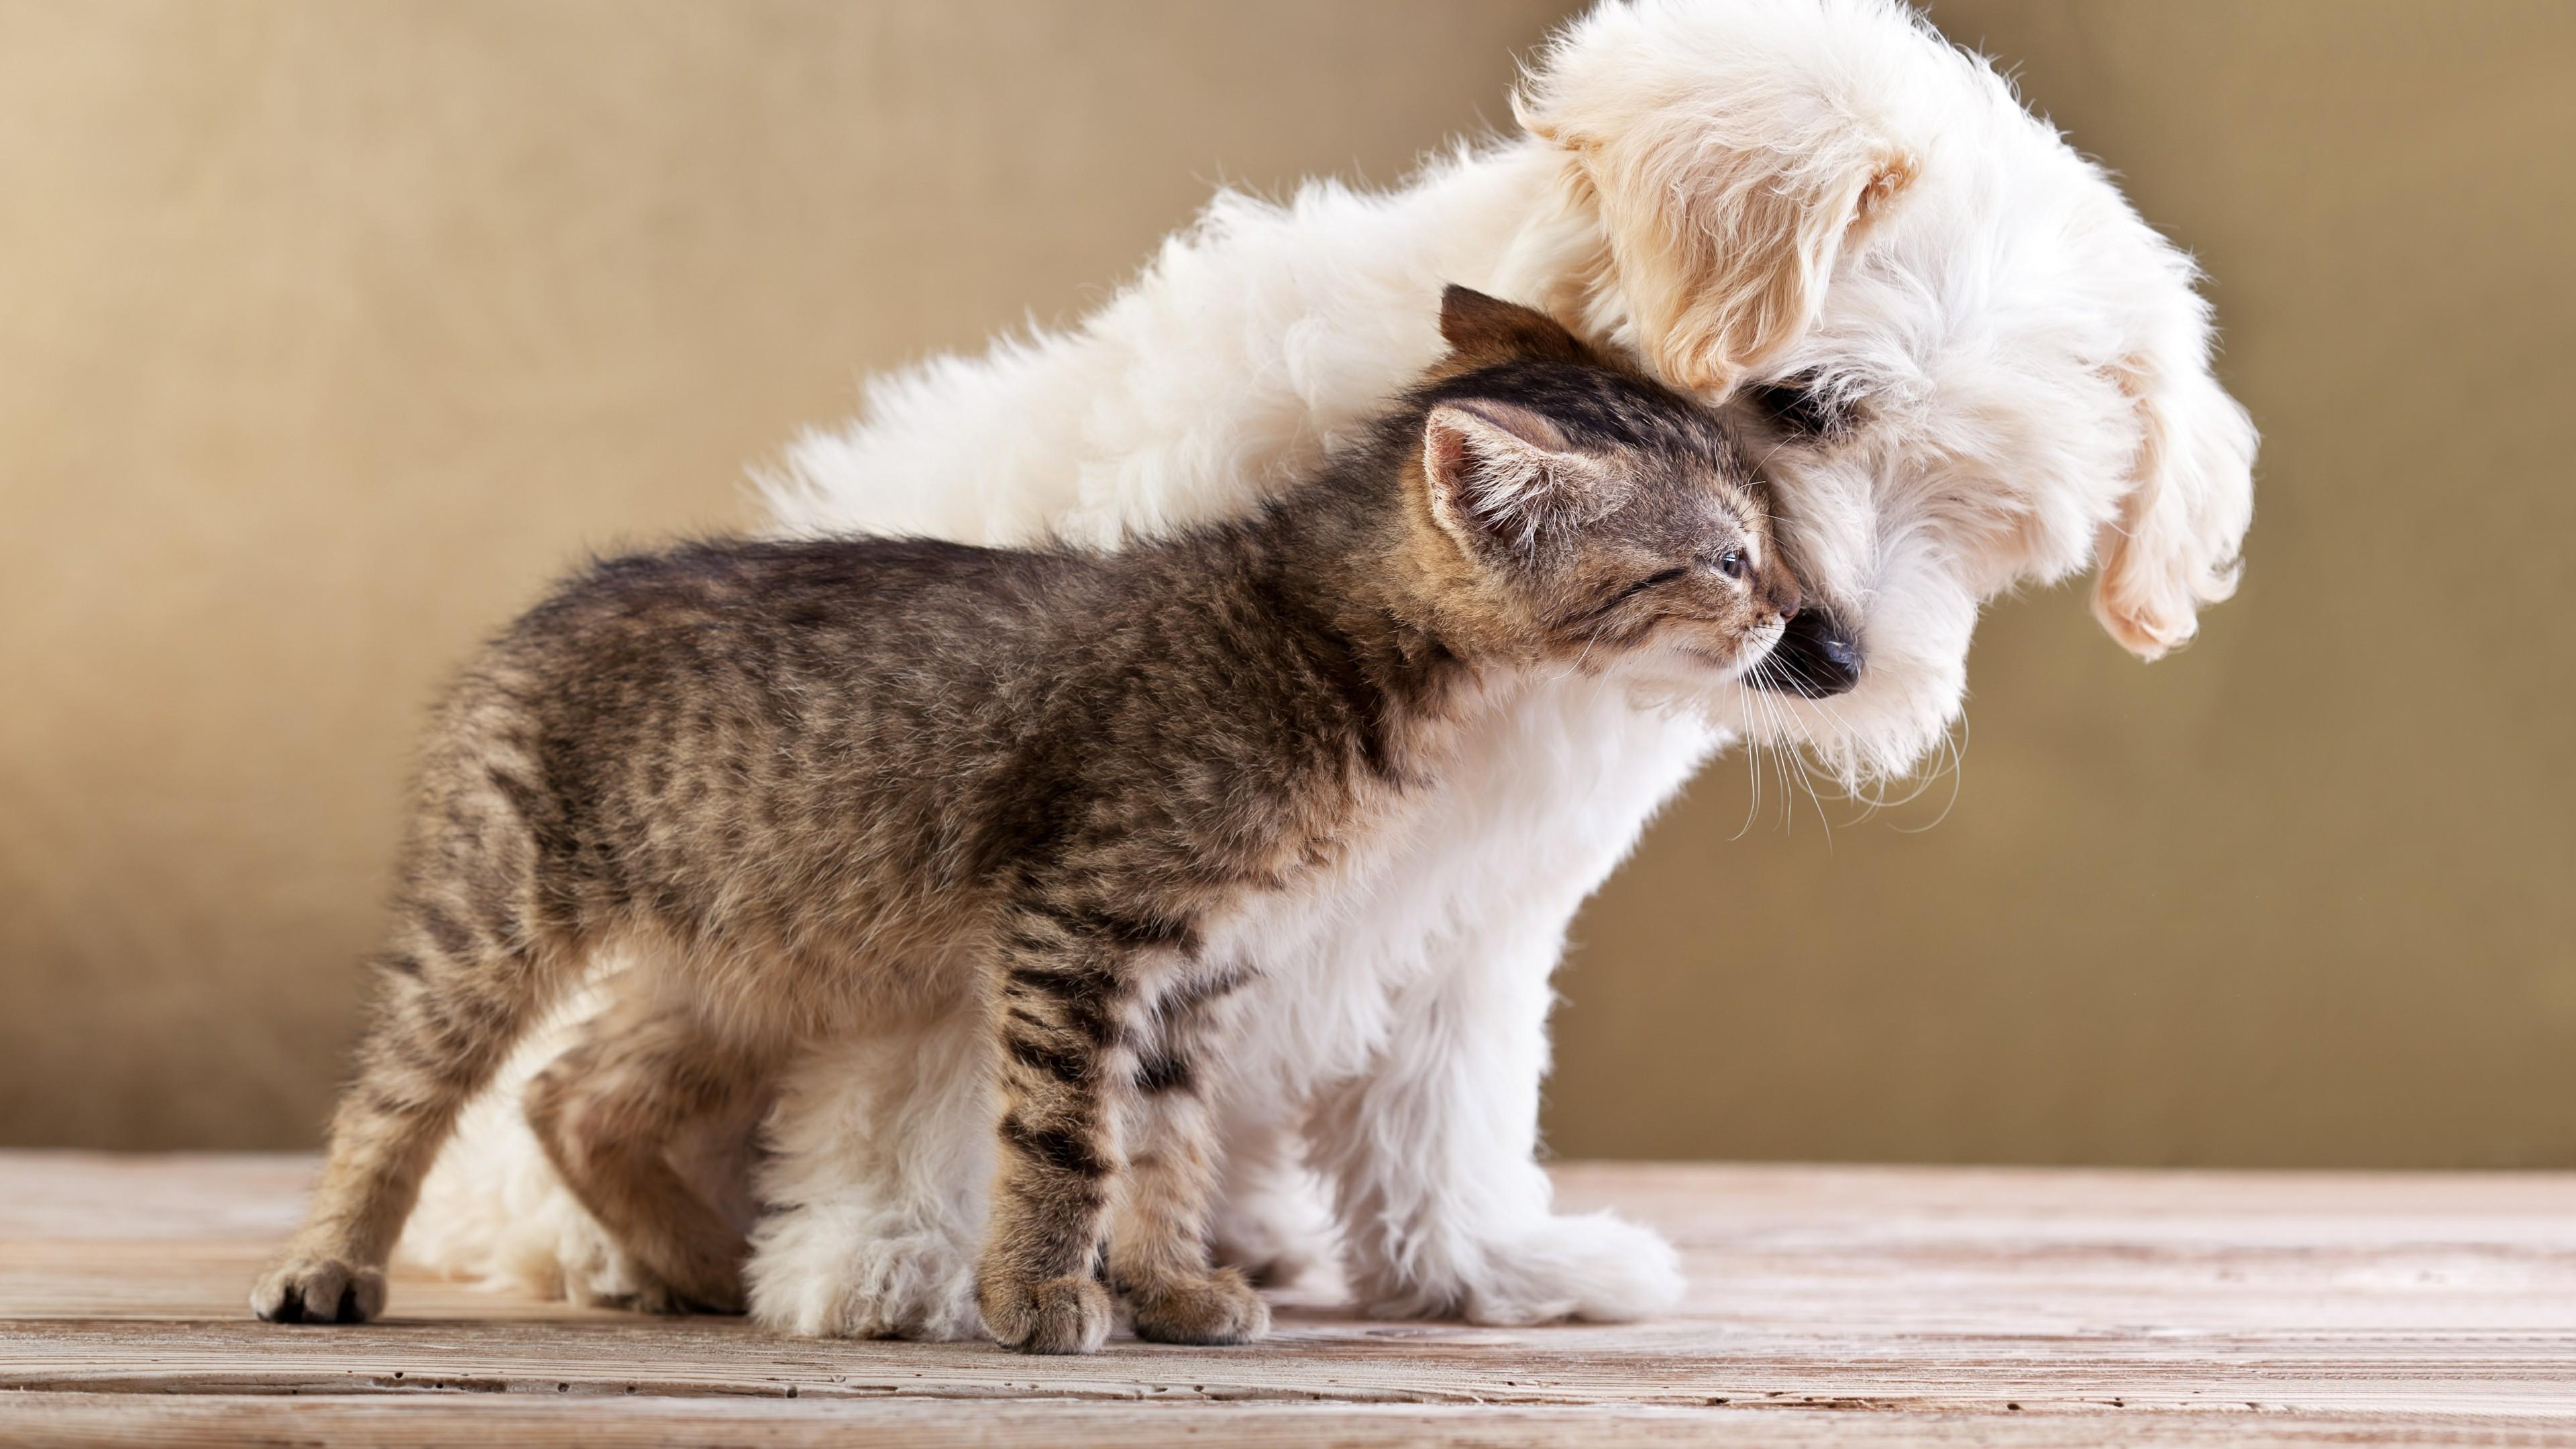 Kitten and puppy friendship wallpaper